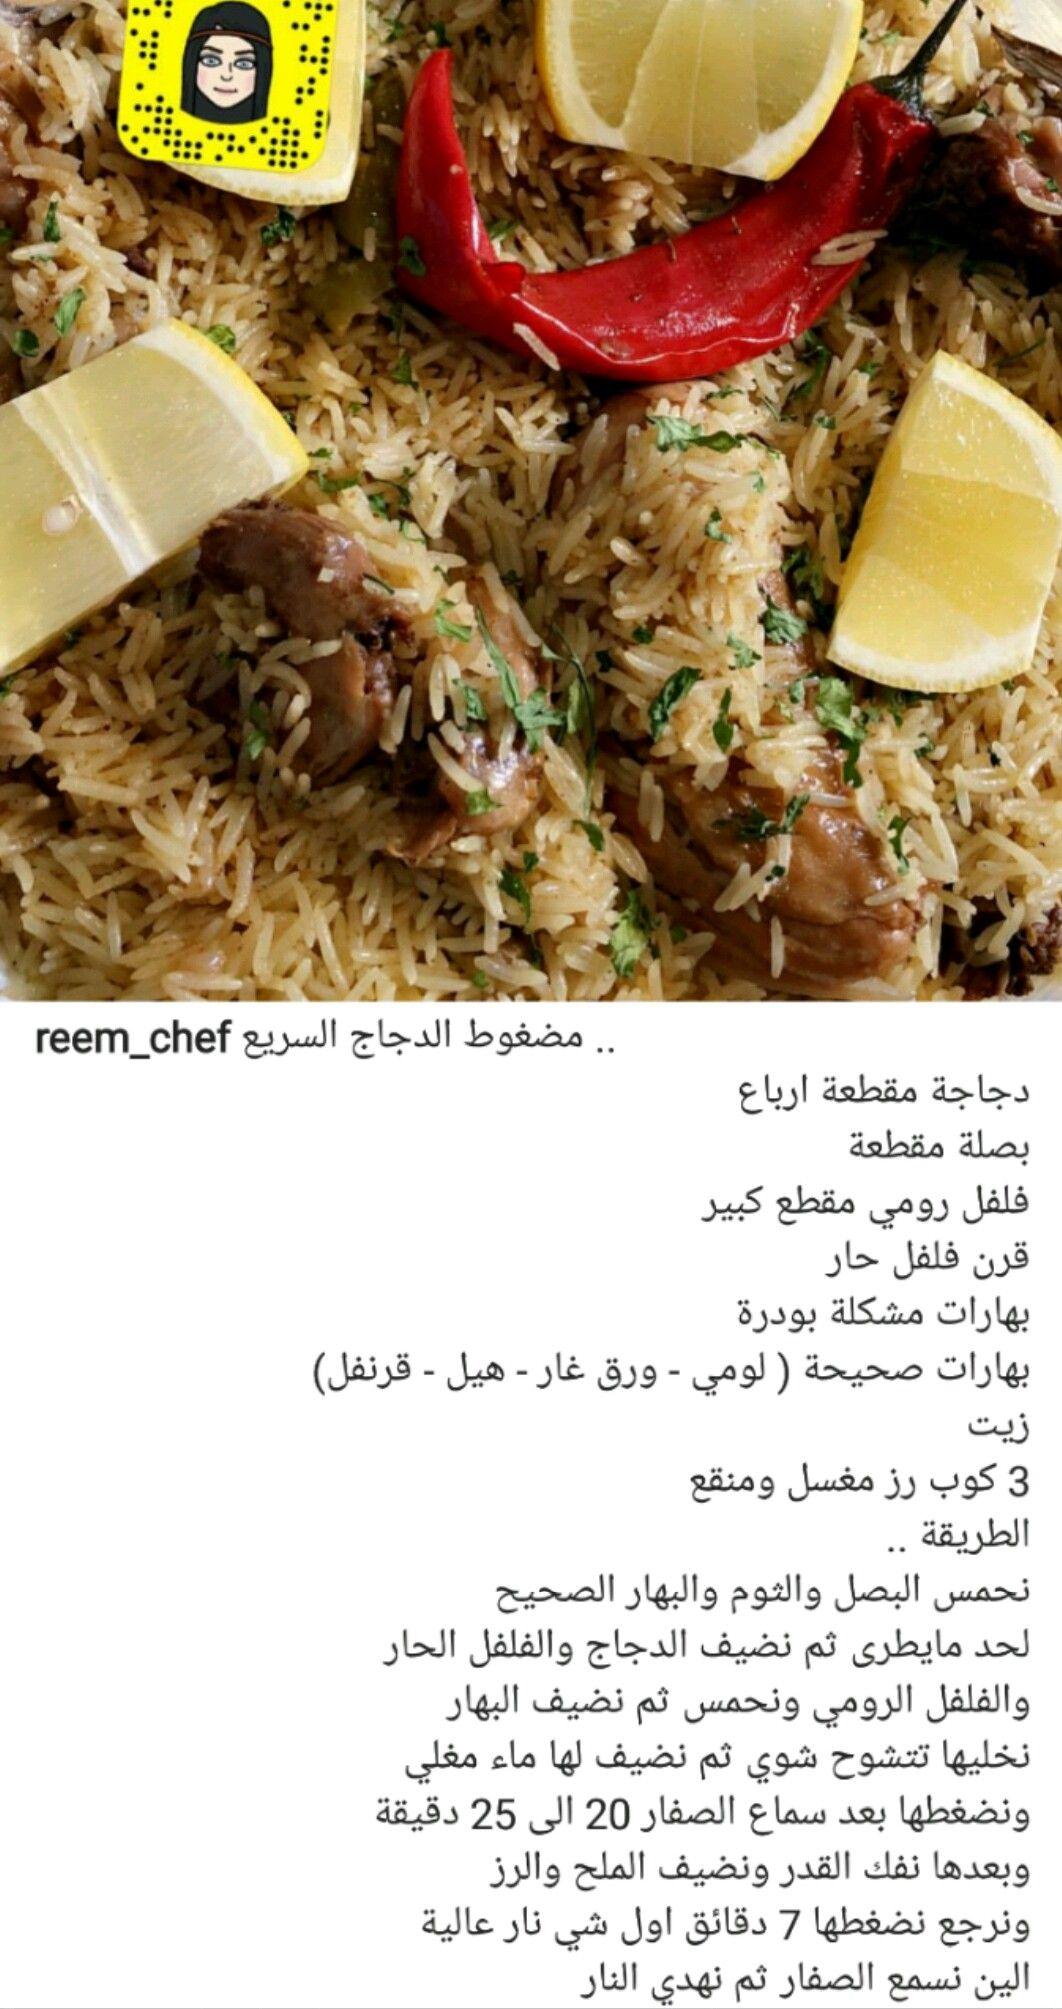 Pin By Asma Alotaibi On طبخ Food Cookery Yummy Food